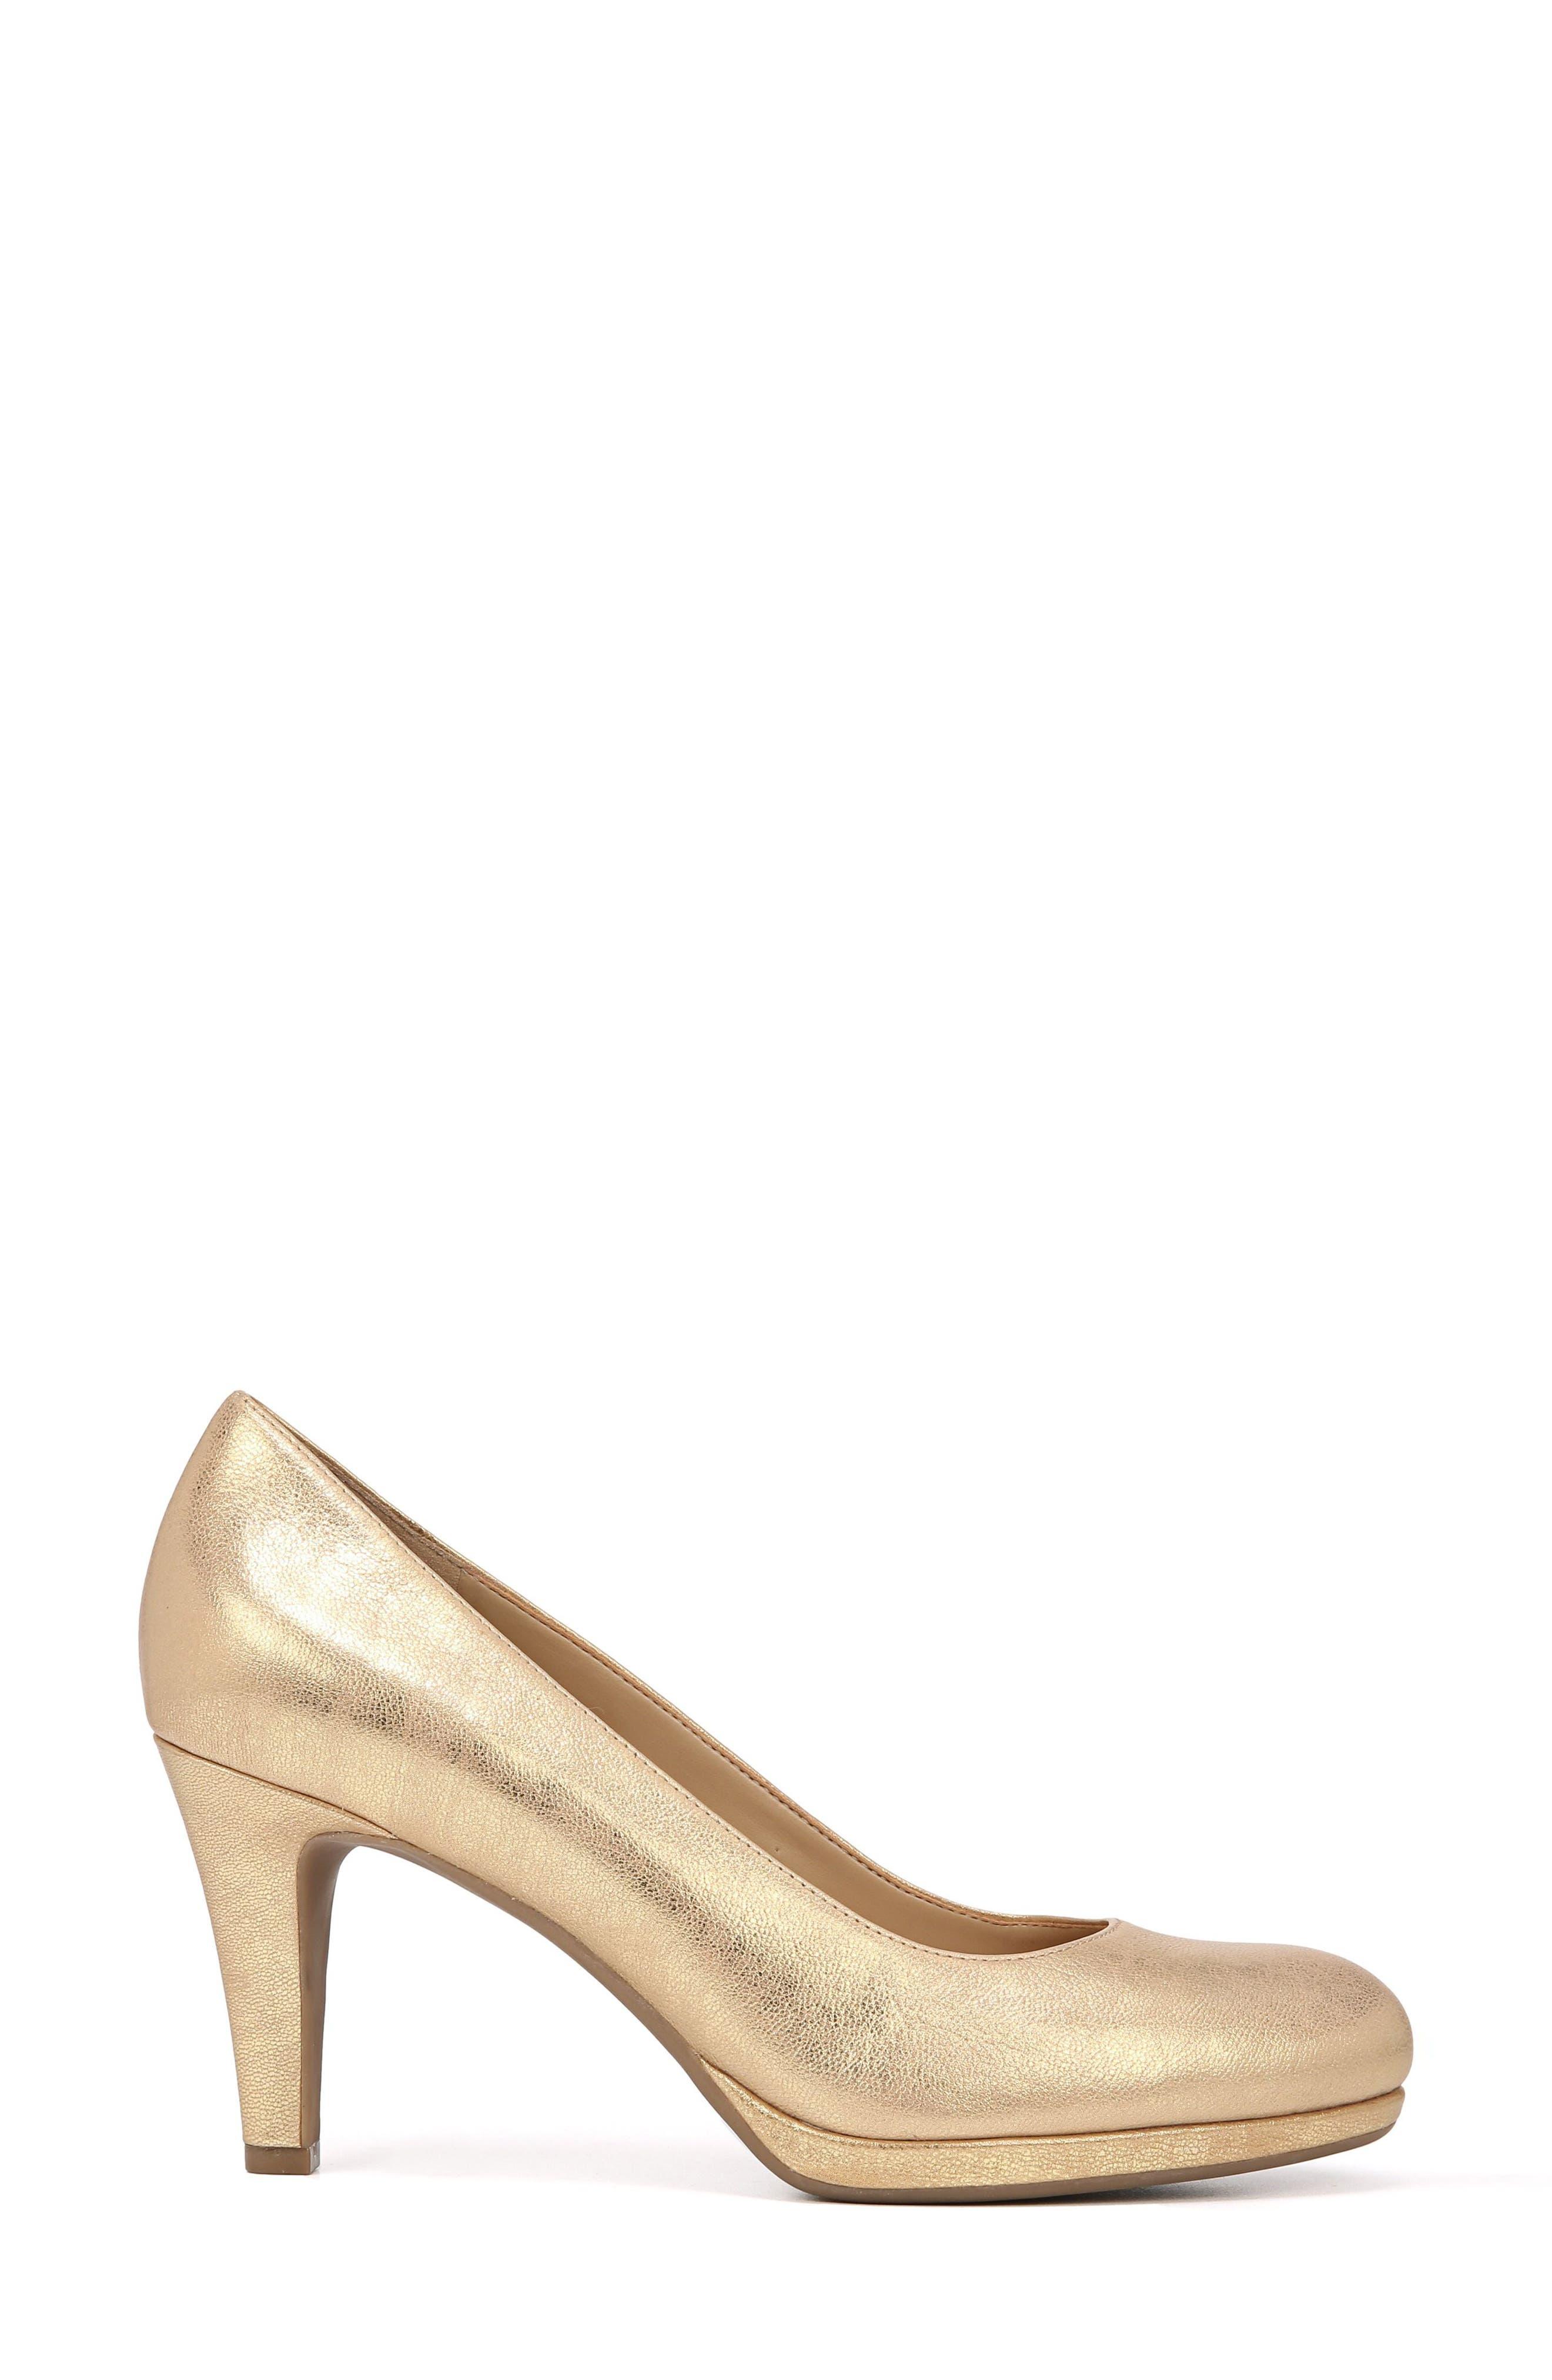 NATURALIZER, 'Michelle' Almond Toe Pump, Alternate thumbnail 3, color, GOLD LEATHER